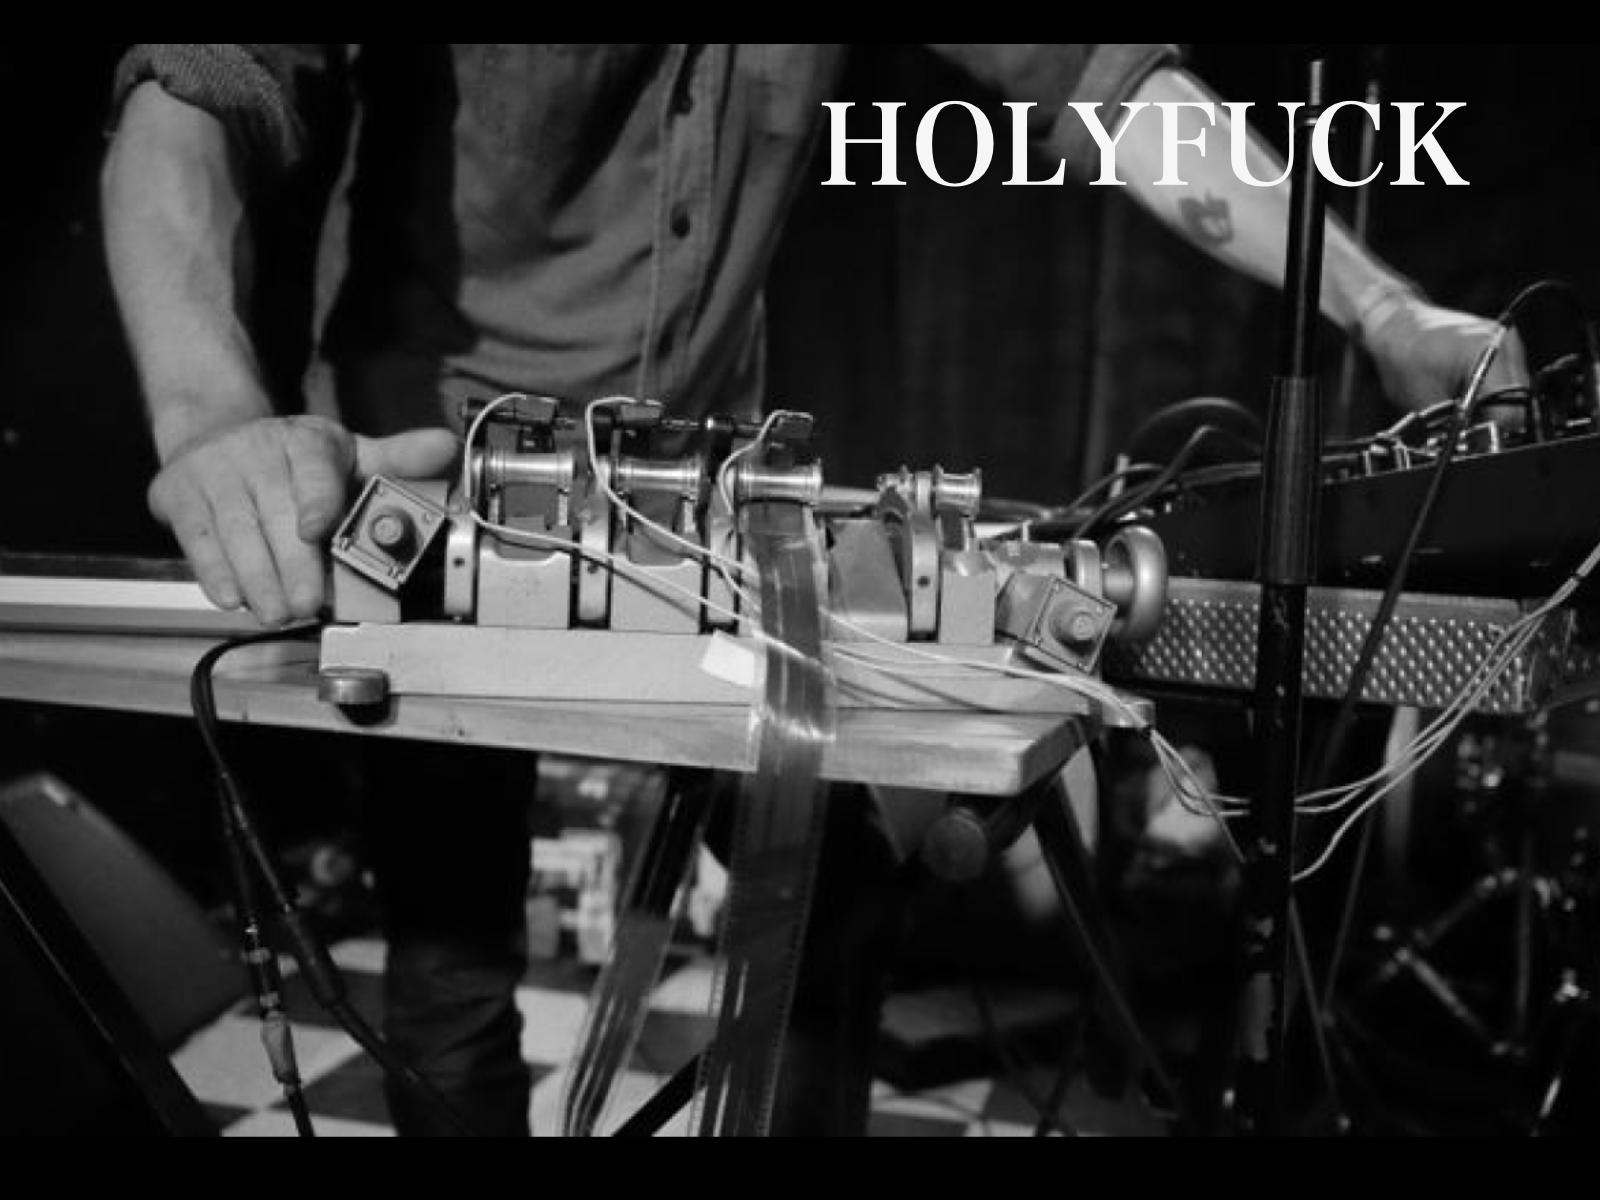 HOLYFUCK LIVE AT CLUB BAHIA L.A